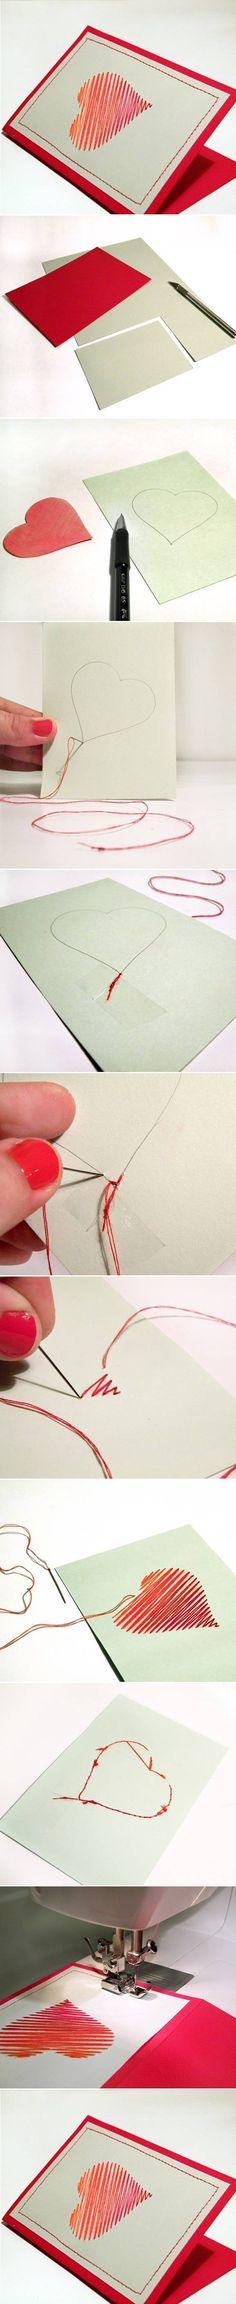 DIY Sew Heart Card DIY Projects   UsefulDIY.com Follow us on Facebook ==> https://www.facebook.com/UsefulDiy